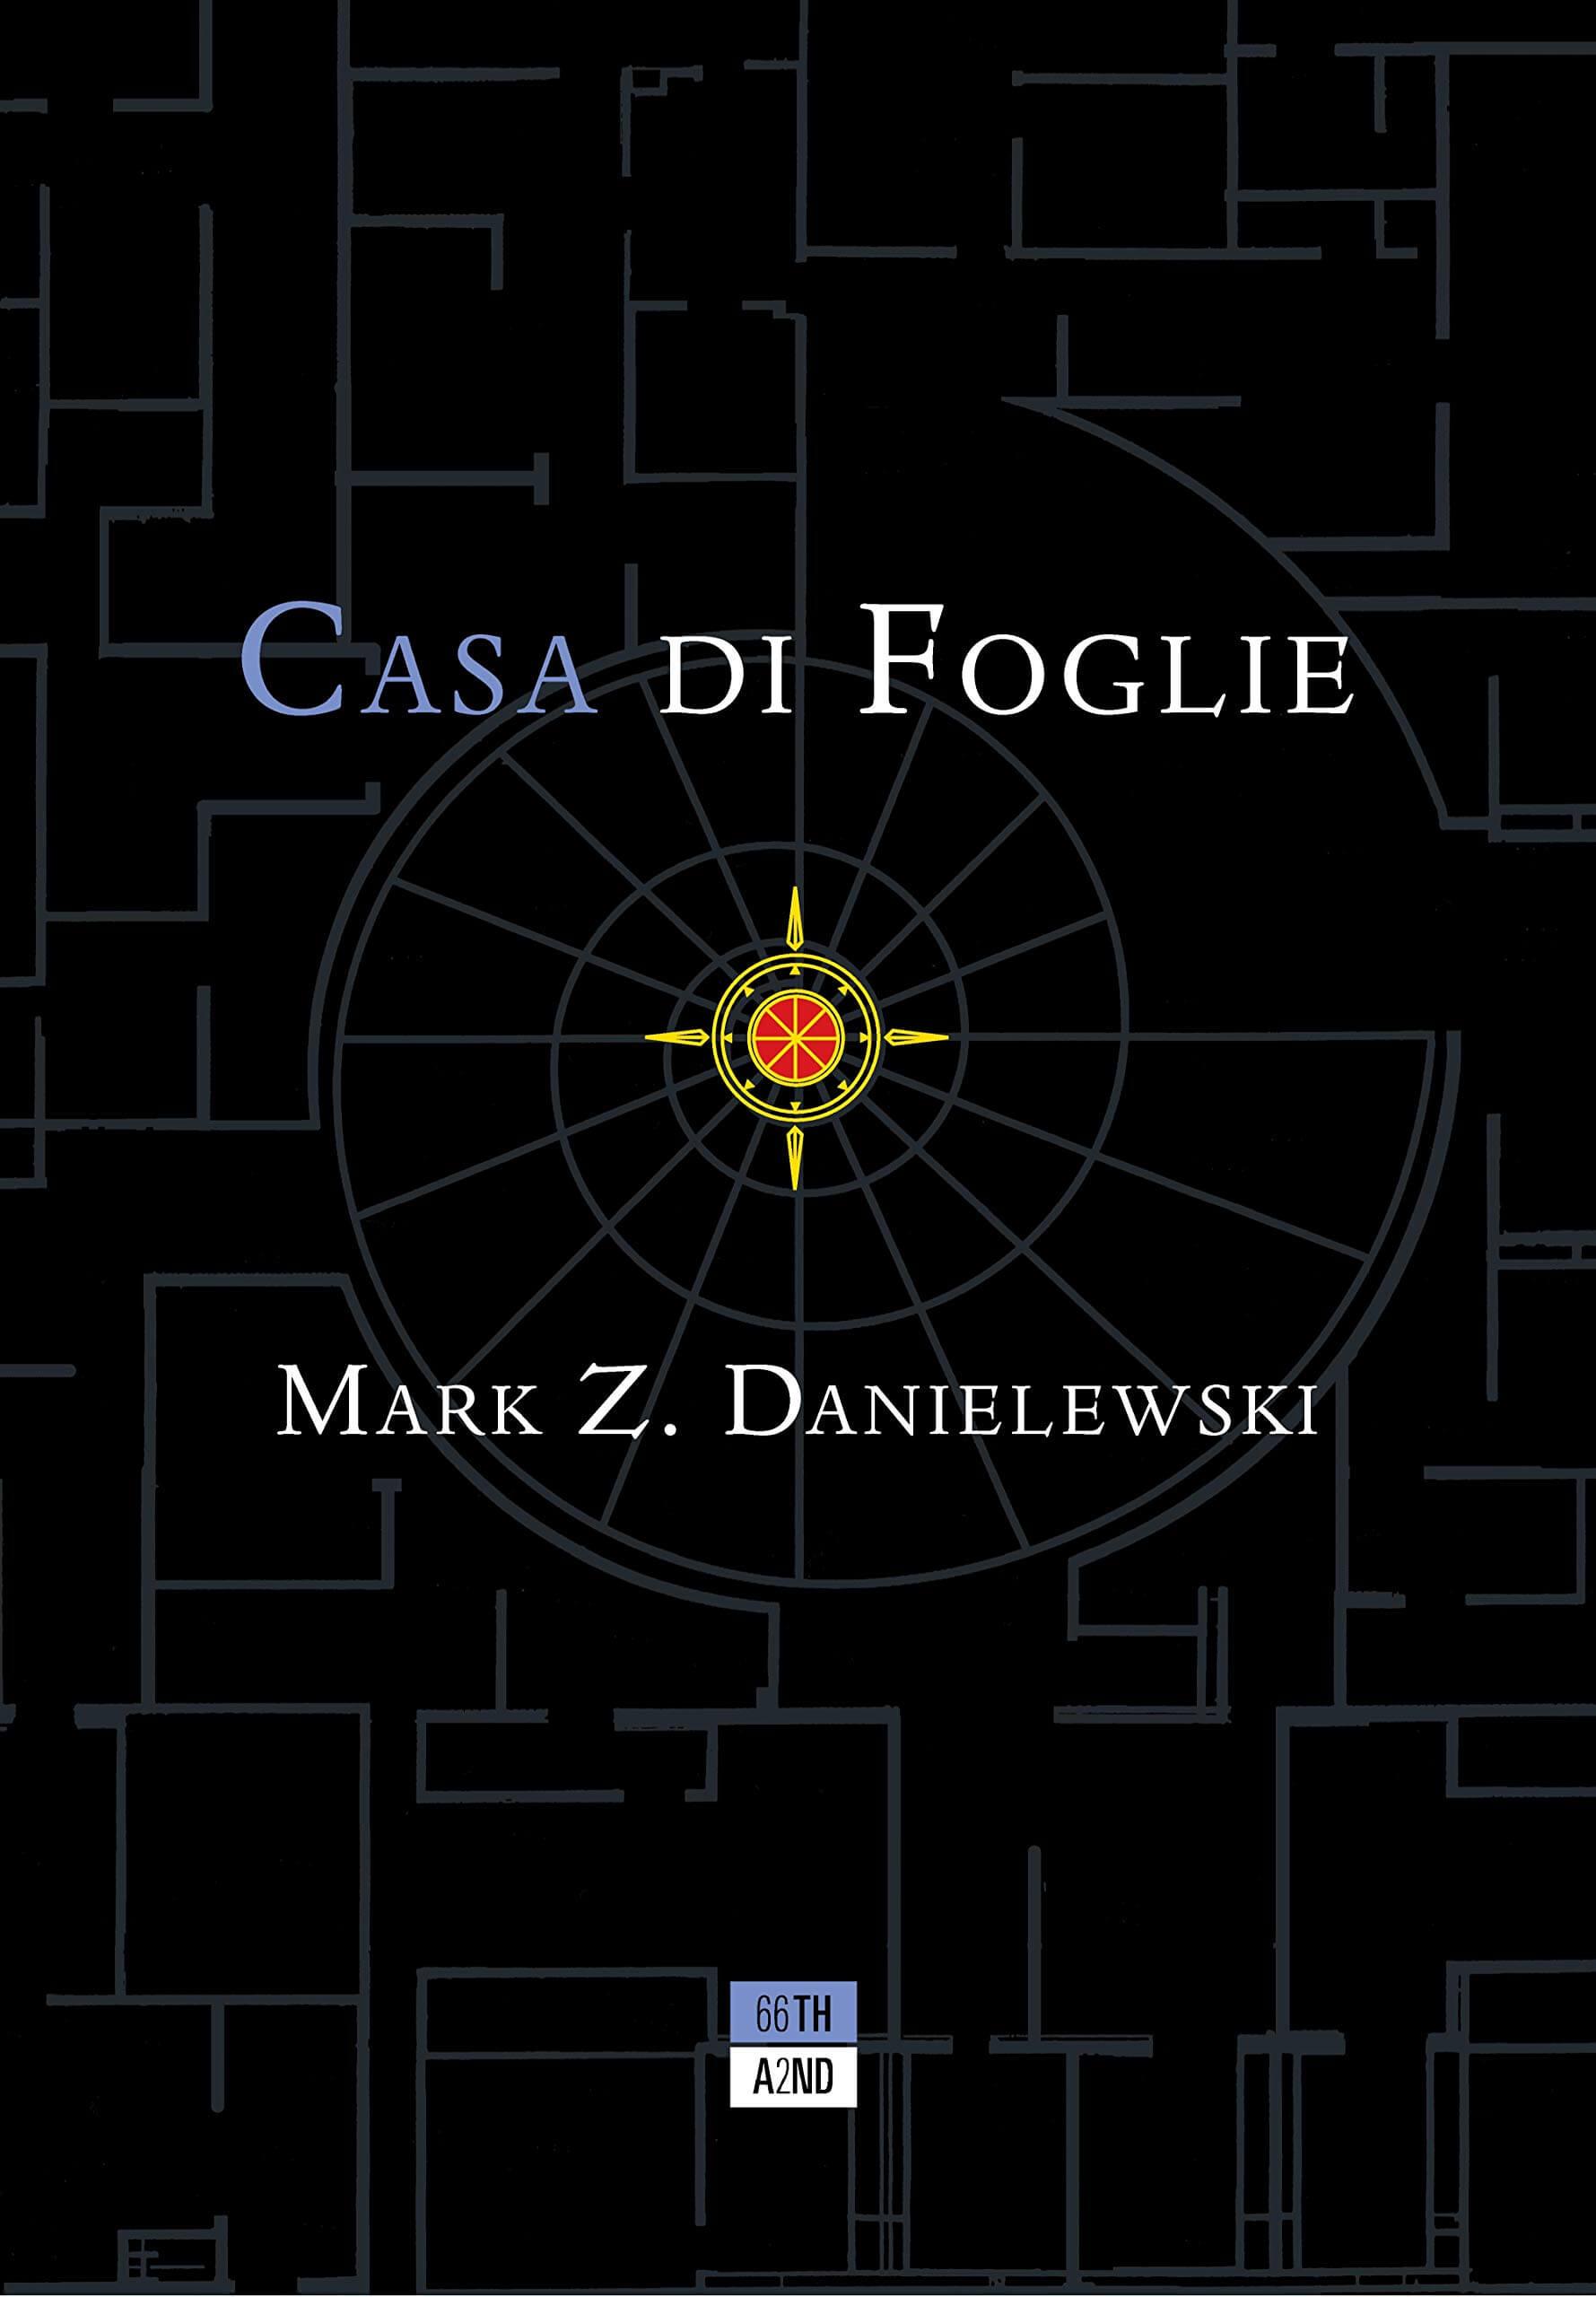 Casa di Foglie - Mark Z. Danielewski - Libri Novembre 2019